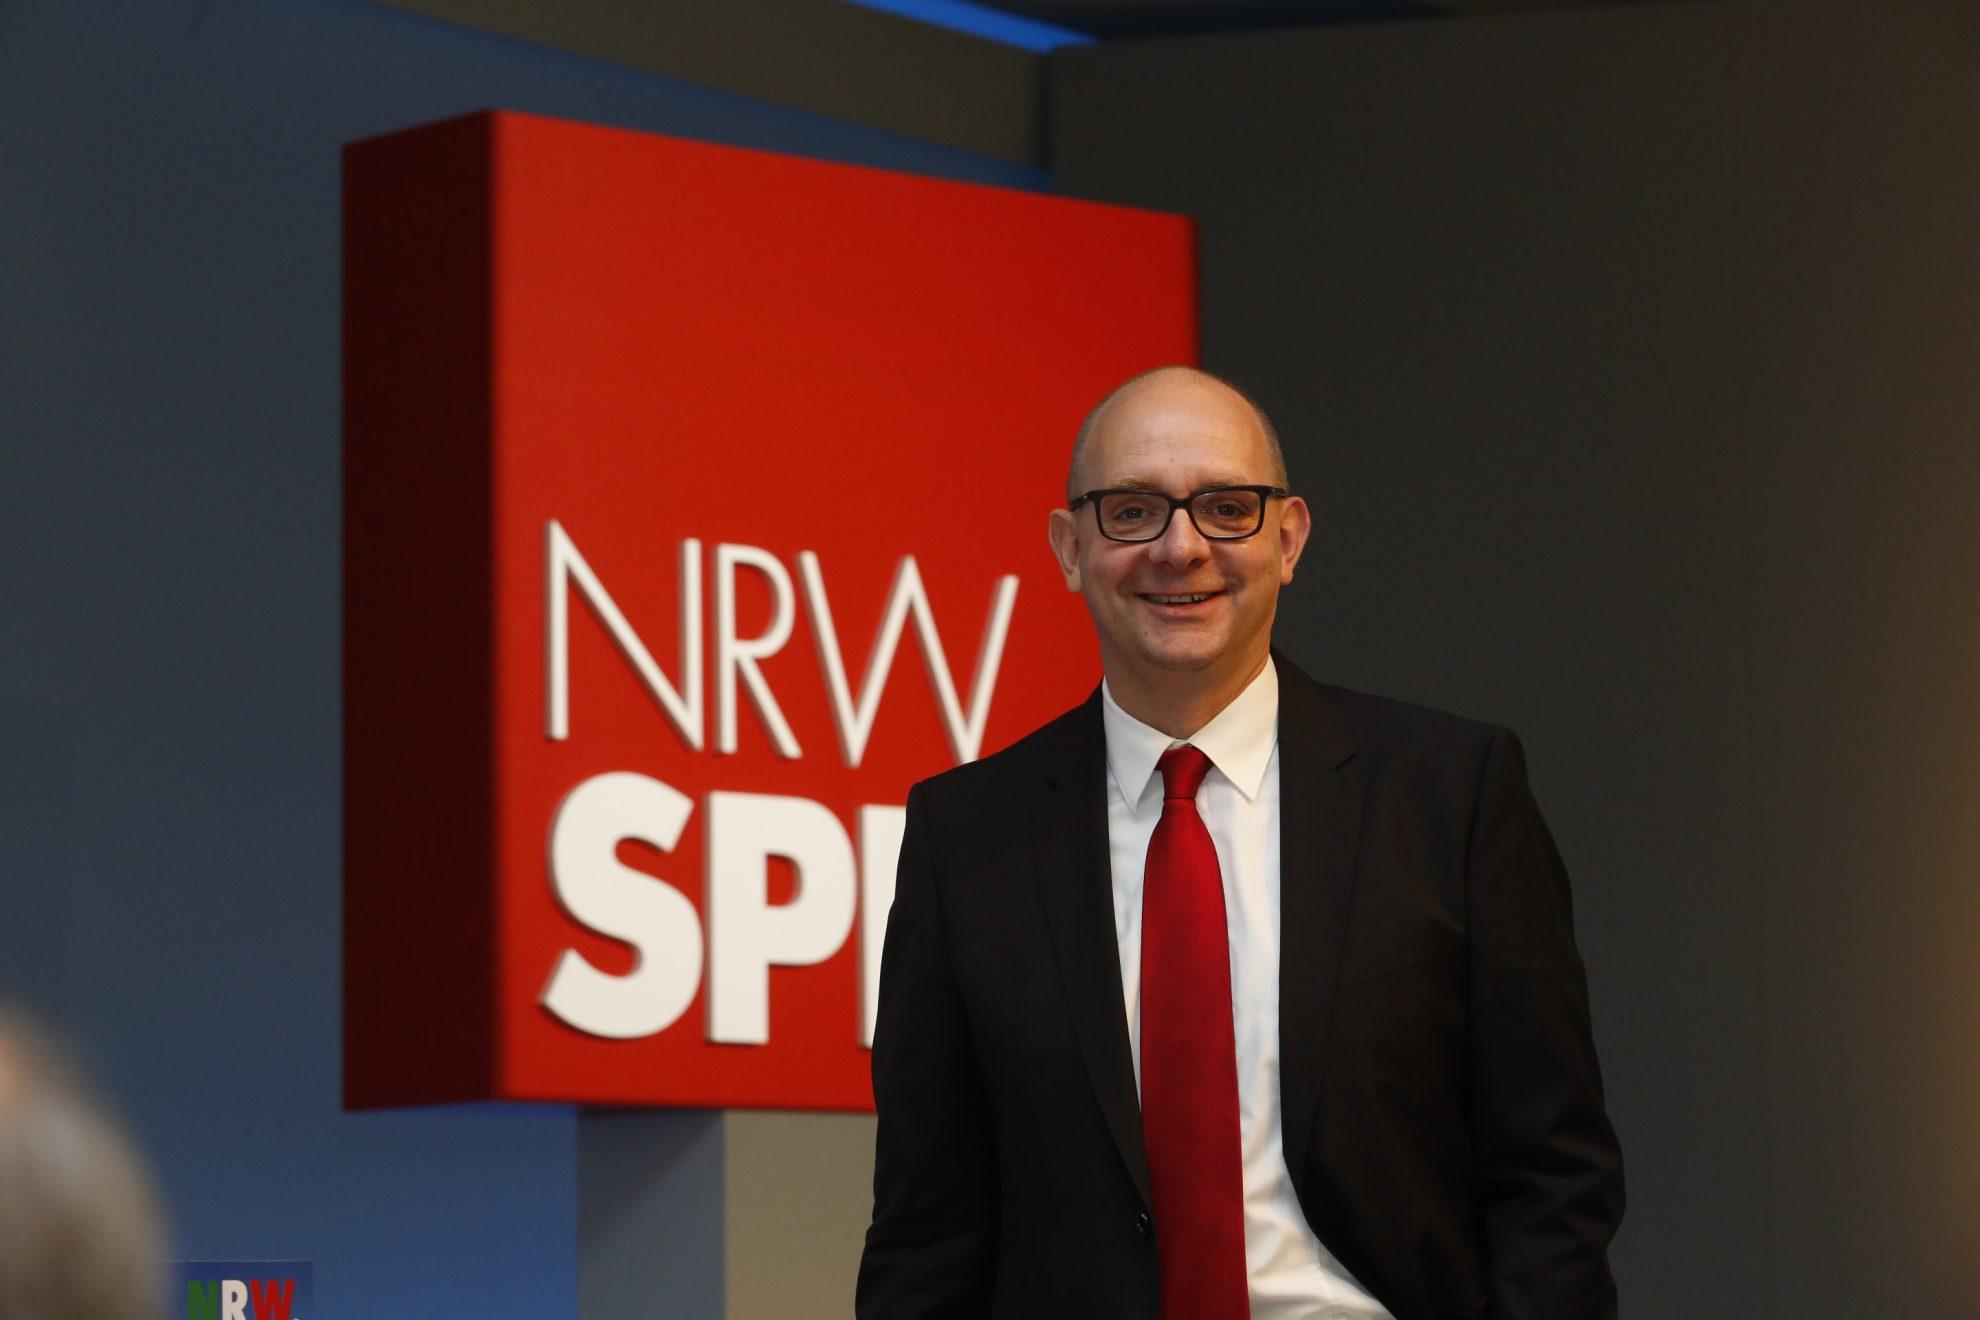 Andre Stinka vor dem Logo der NRWSPD